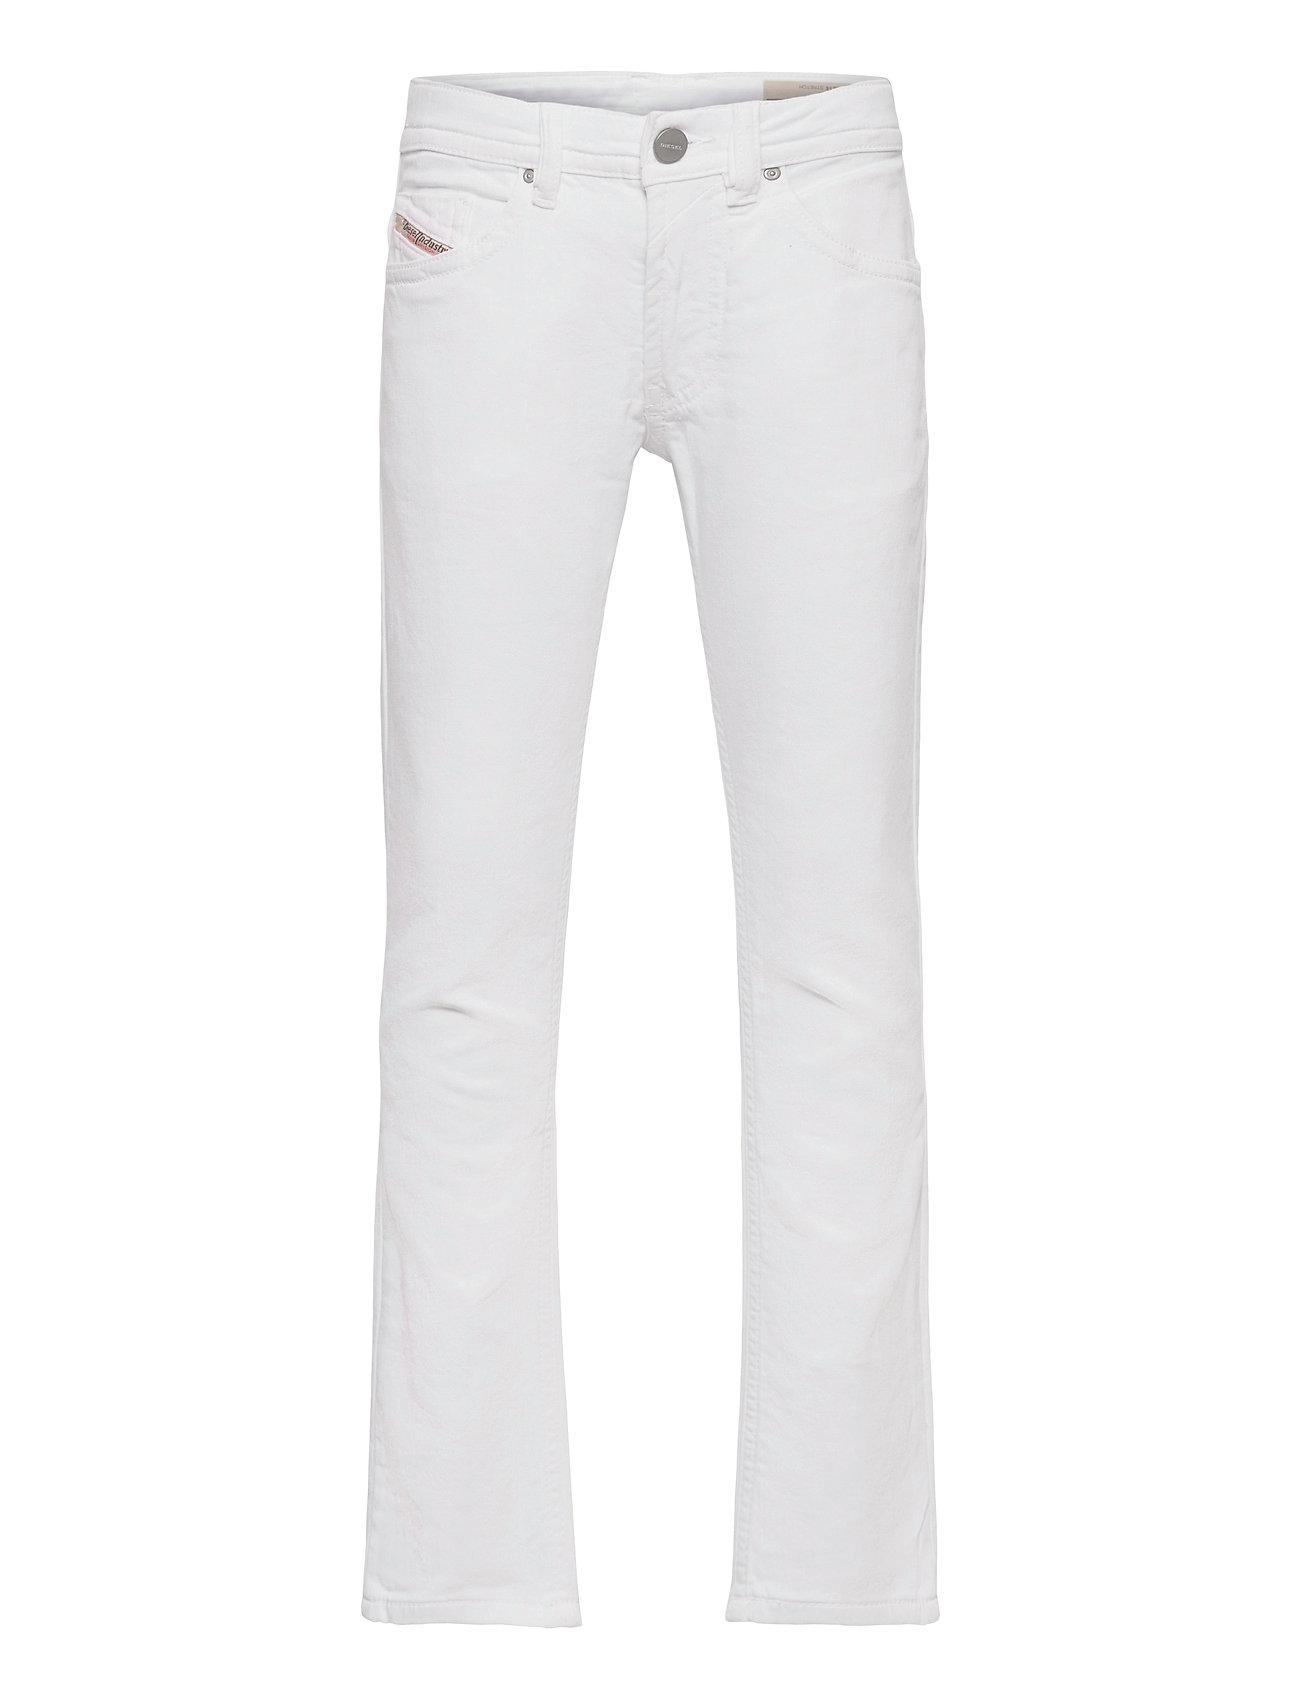 Diesel - THOMMER-J JJJ TROUSERS - jeans - bianco - 0